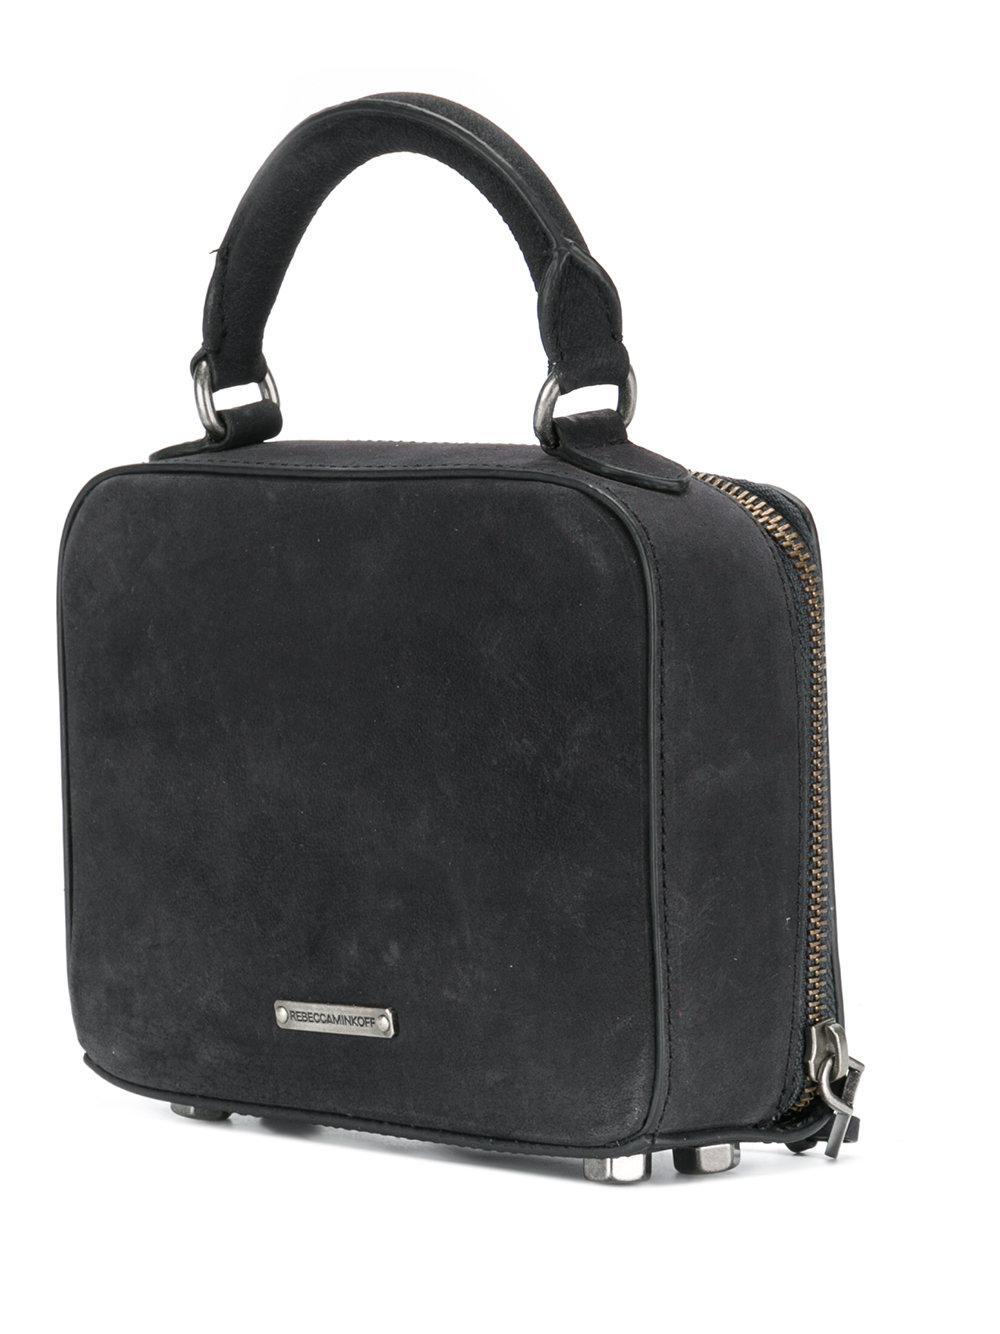 Rebecca Minkoff Leather Embellished Box Cross Body Bag in Black